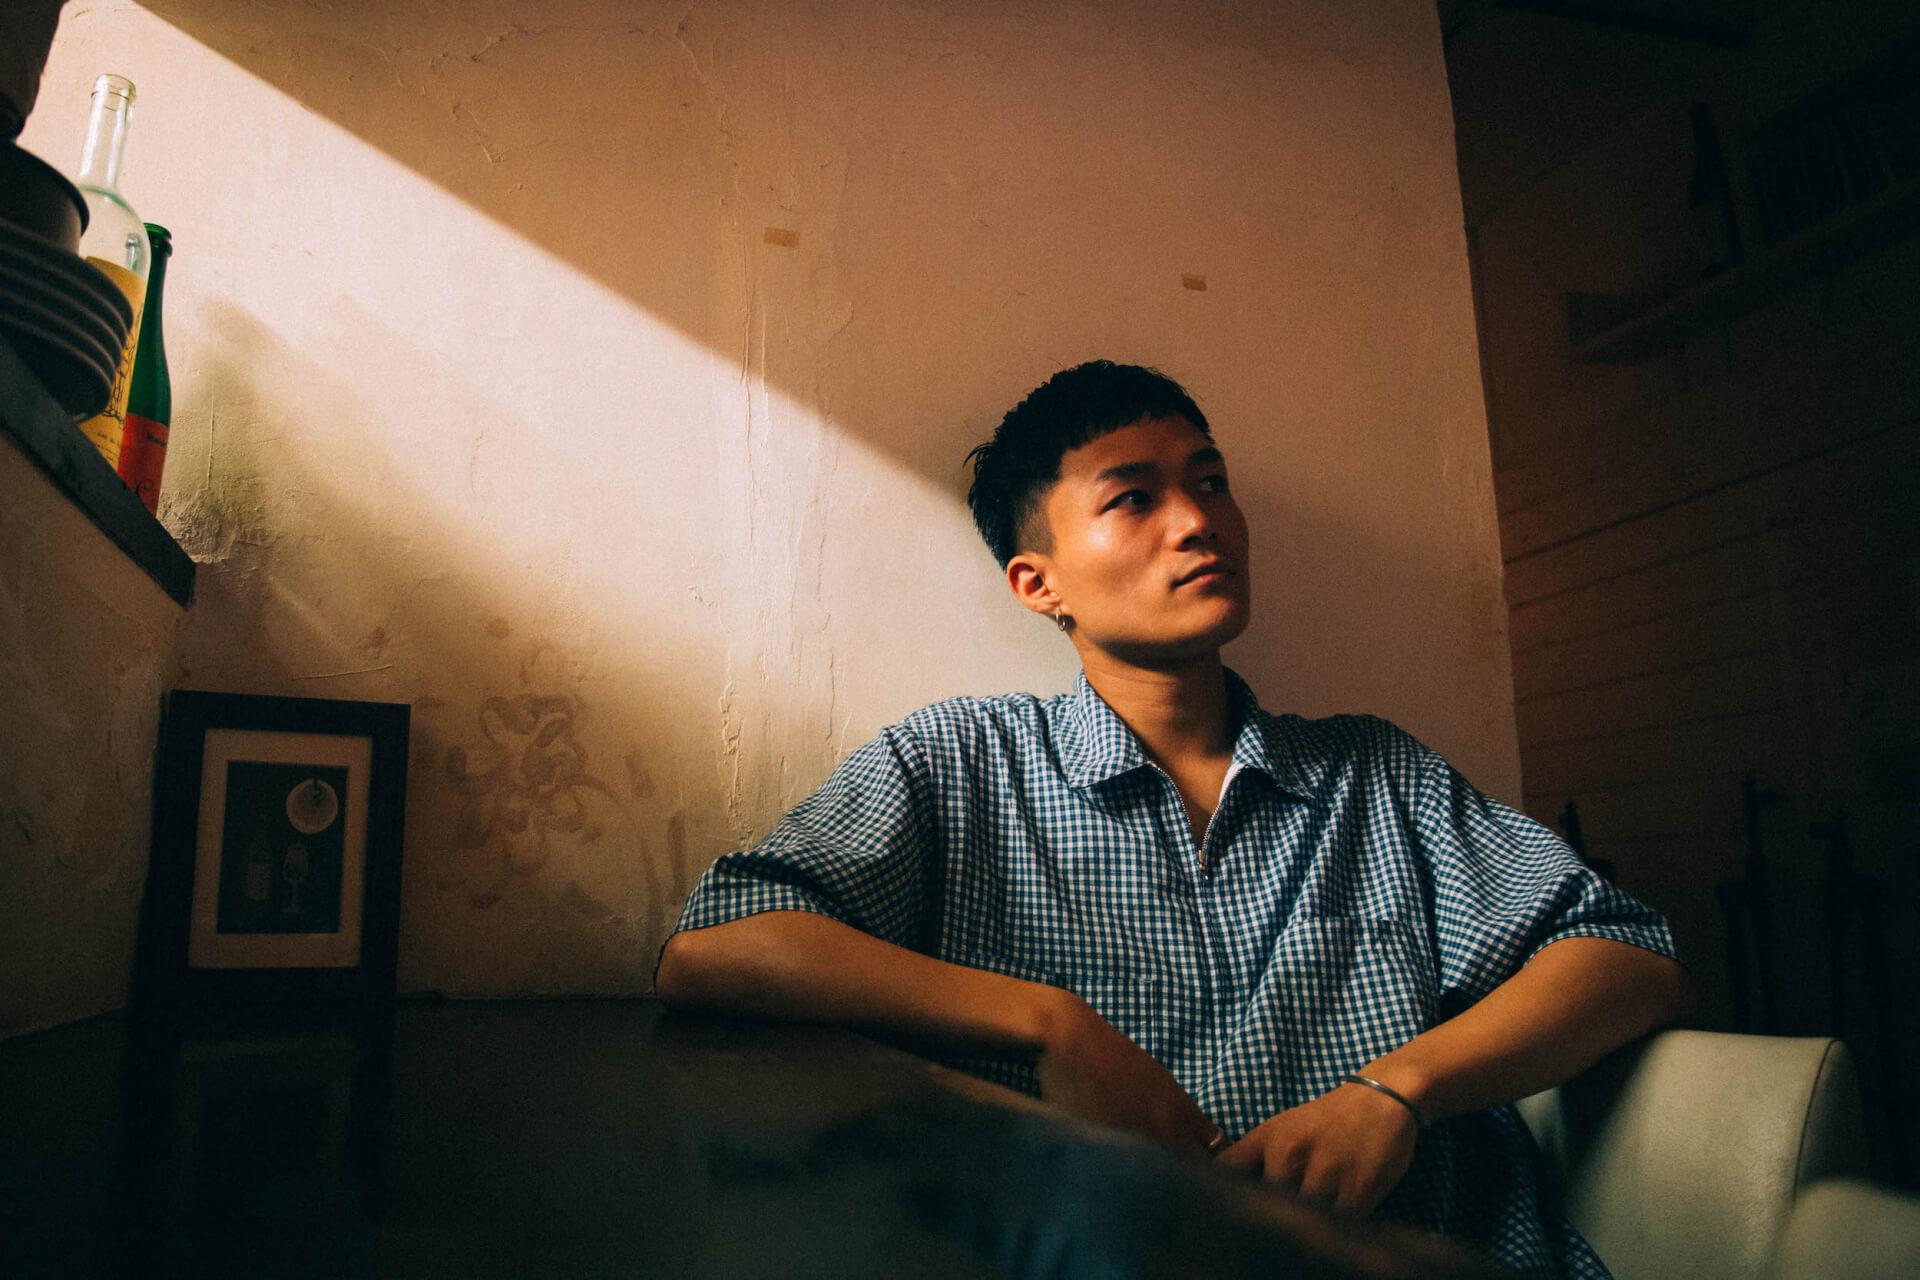 Shin Sakiuraが持つ無数の顔 — 初期衝動と現在地、ワンマンライブを語るインタビュー interview_190909_shinsakiura_744